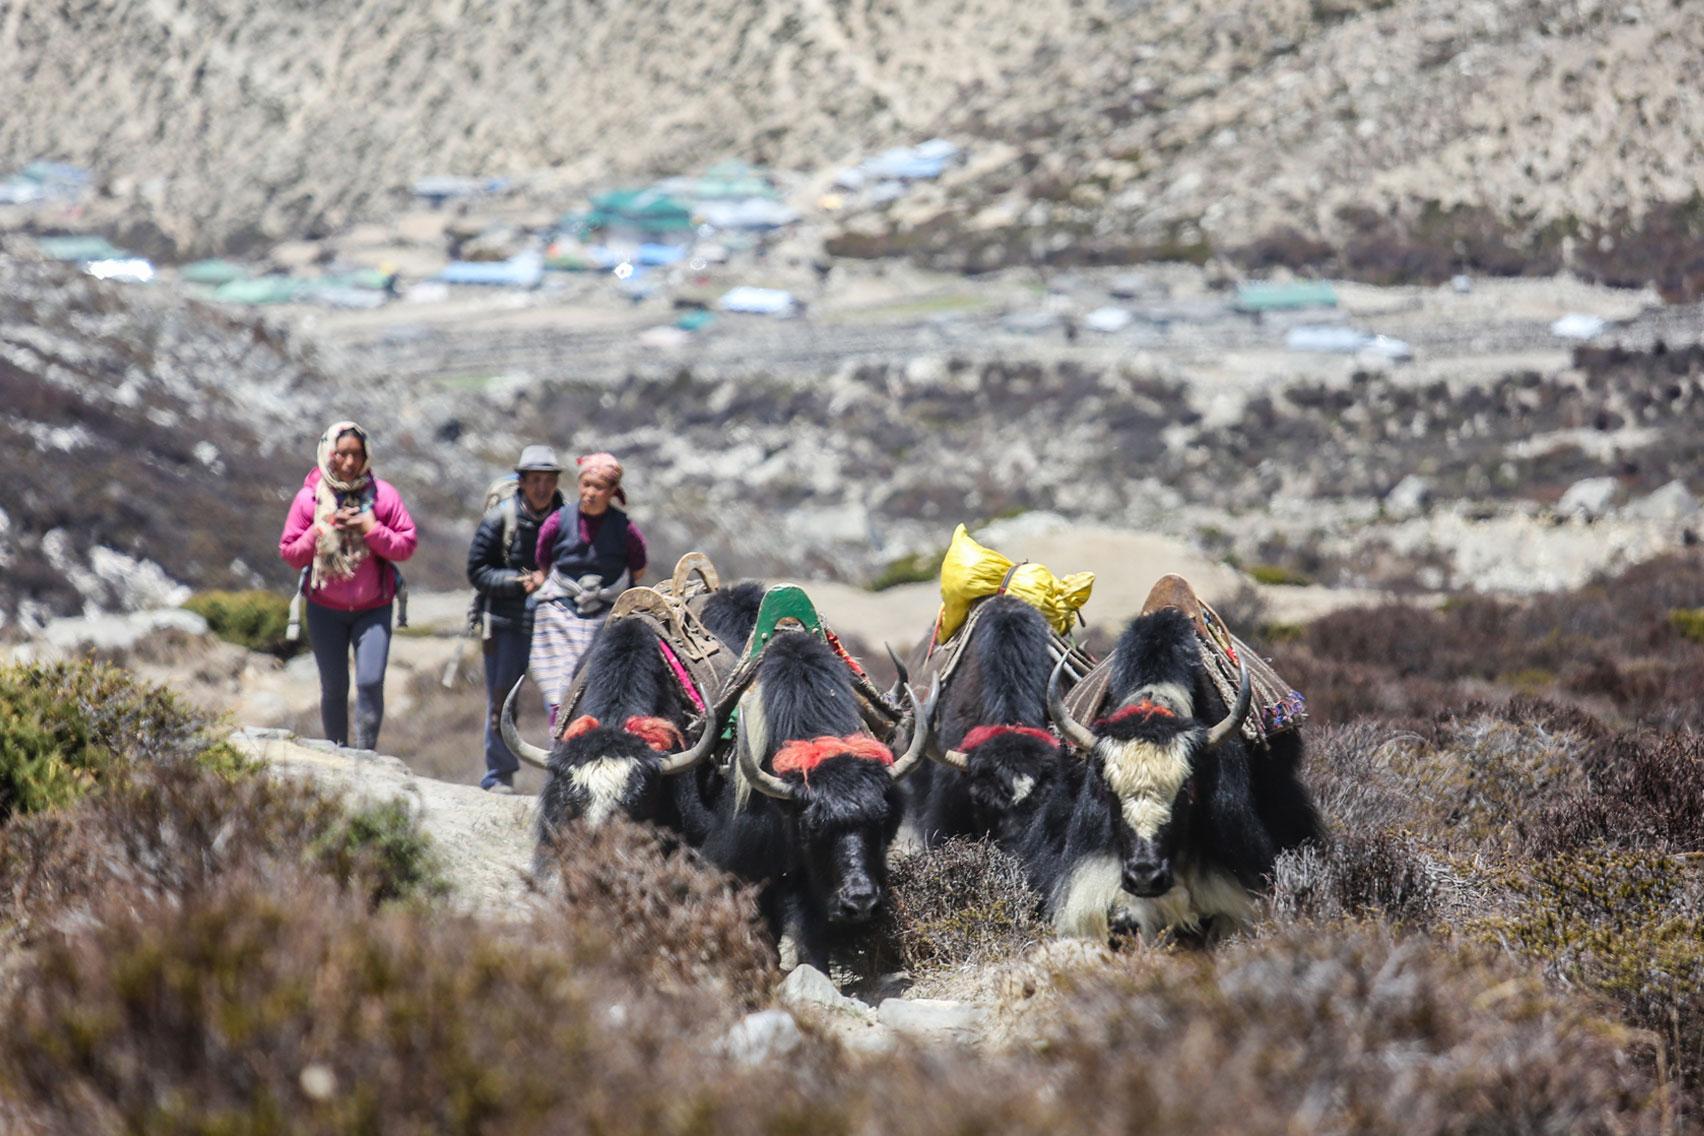 Day 7: Trek from Tengboche (3860m) to Dingboche (6hrs, 4440m)